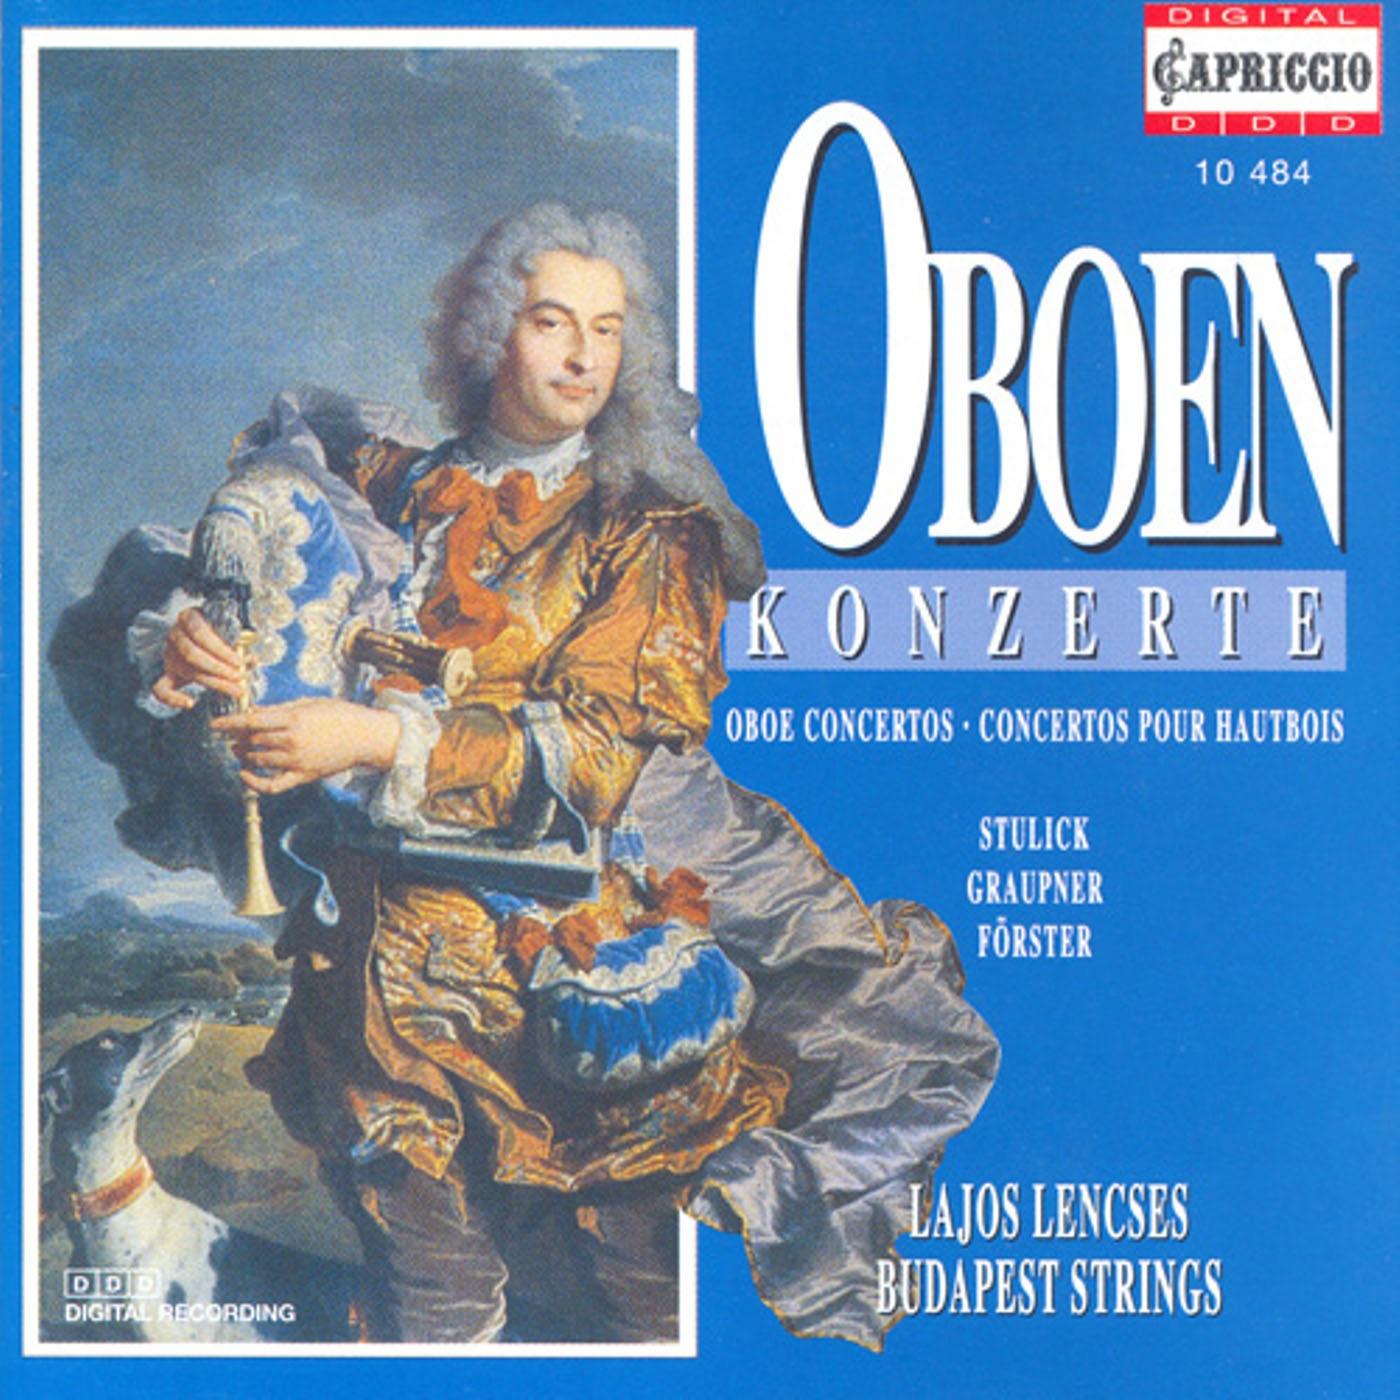 Oboe Concertos - Stulick, M.N. - Graupner, C.- Forster, C. - Dittersdorf, C.D. Von